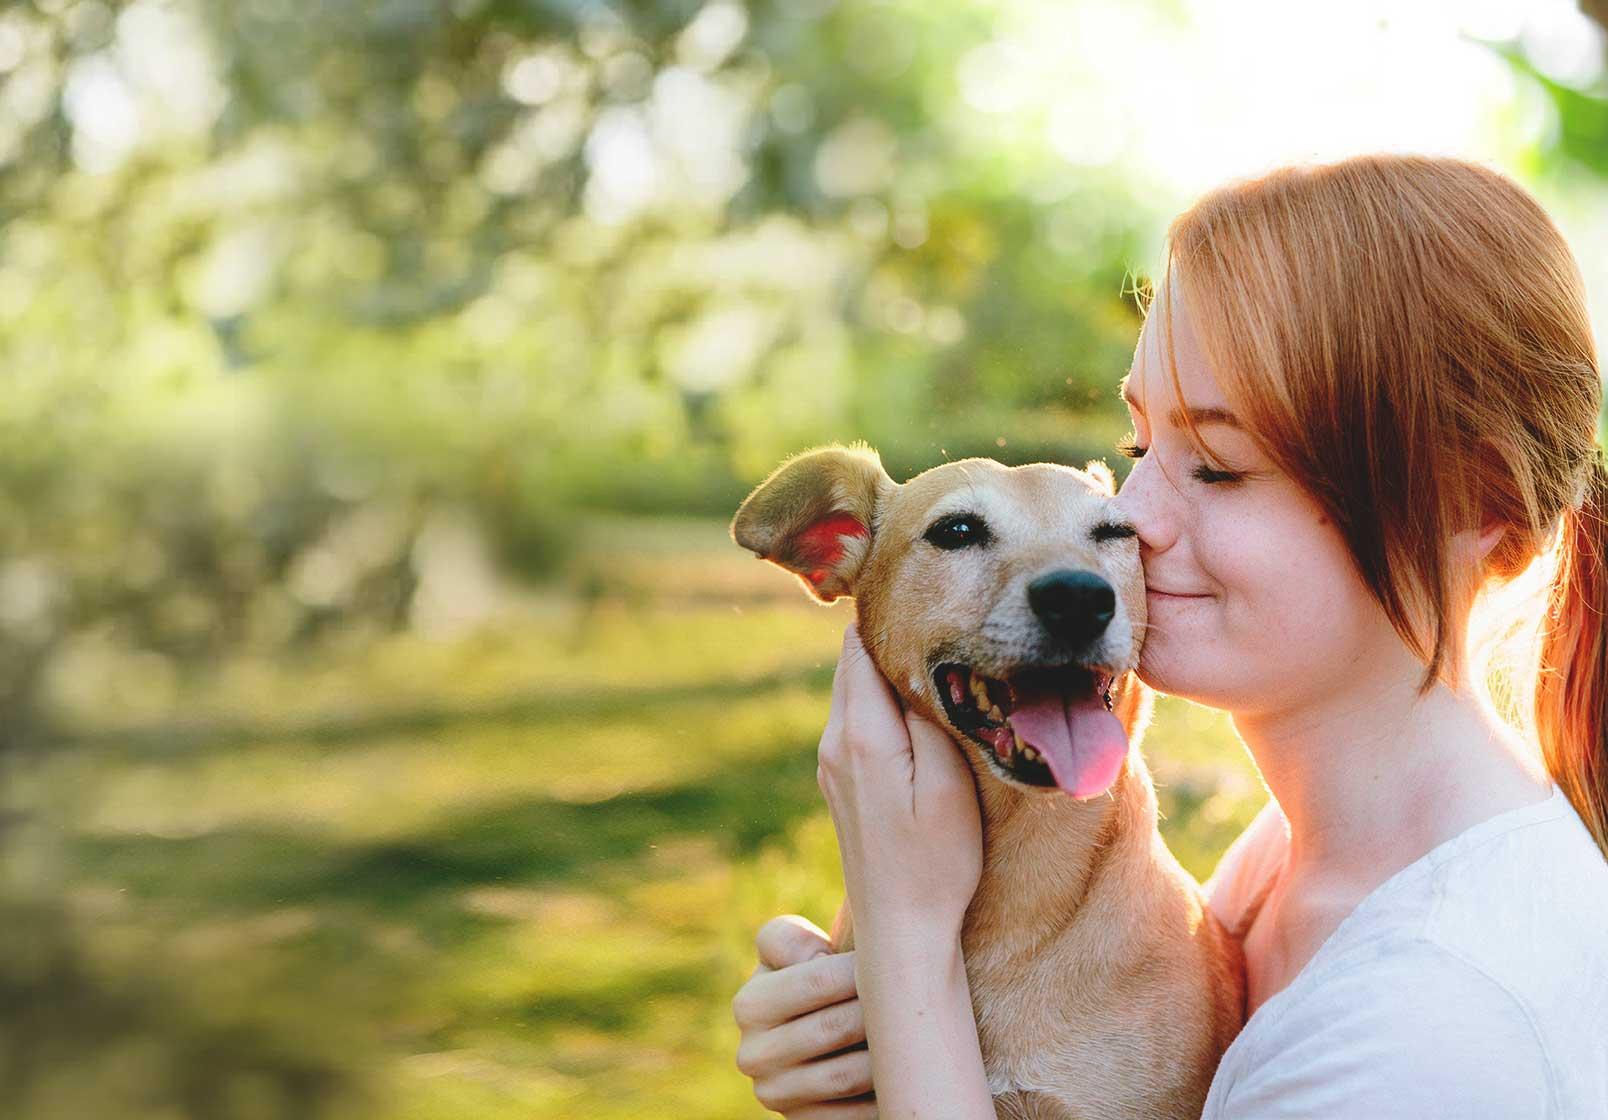 Pet Rabbit Insurance Comparison to Veterinary Bills